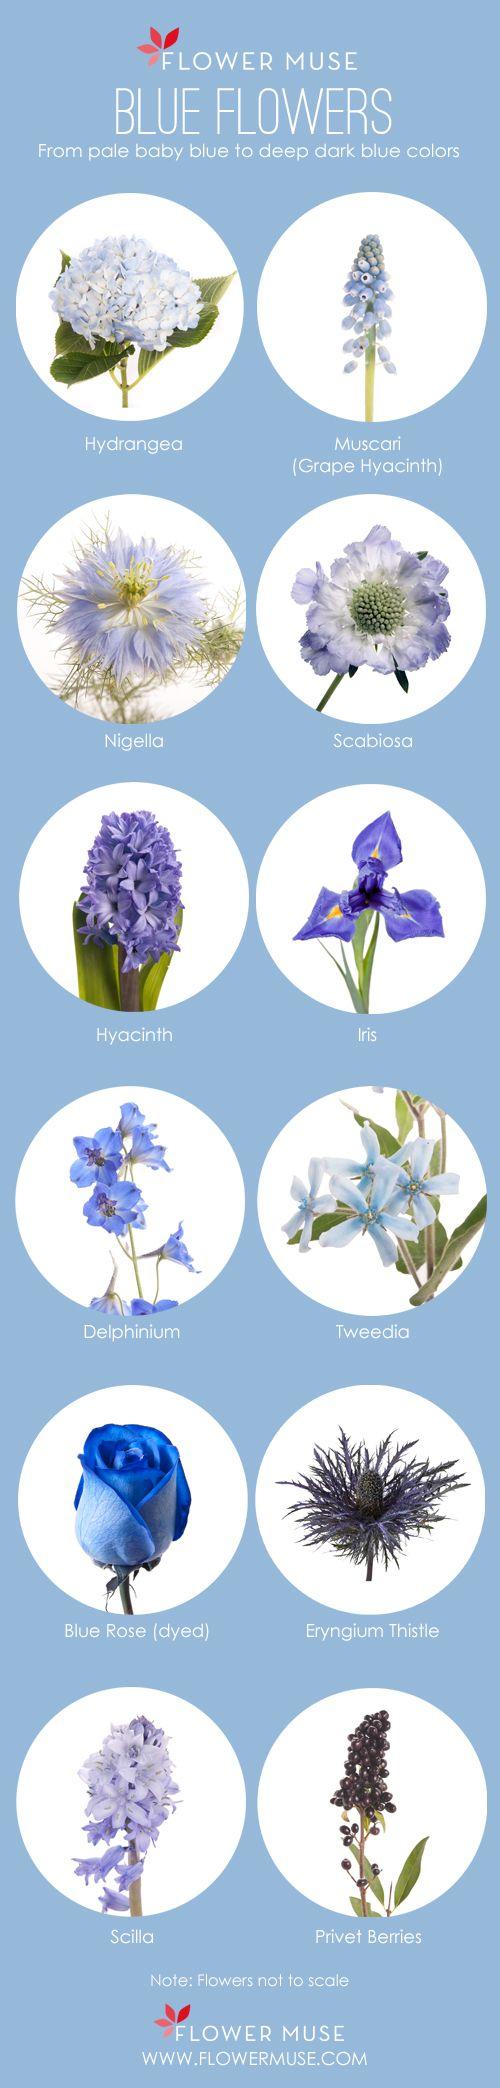 Our Favorite Blue Flowers Blue wedding flowers, Flower